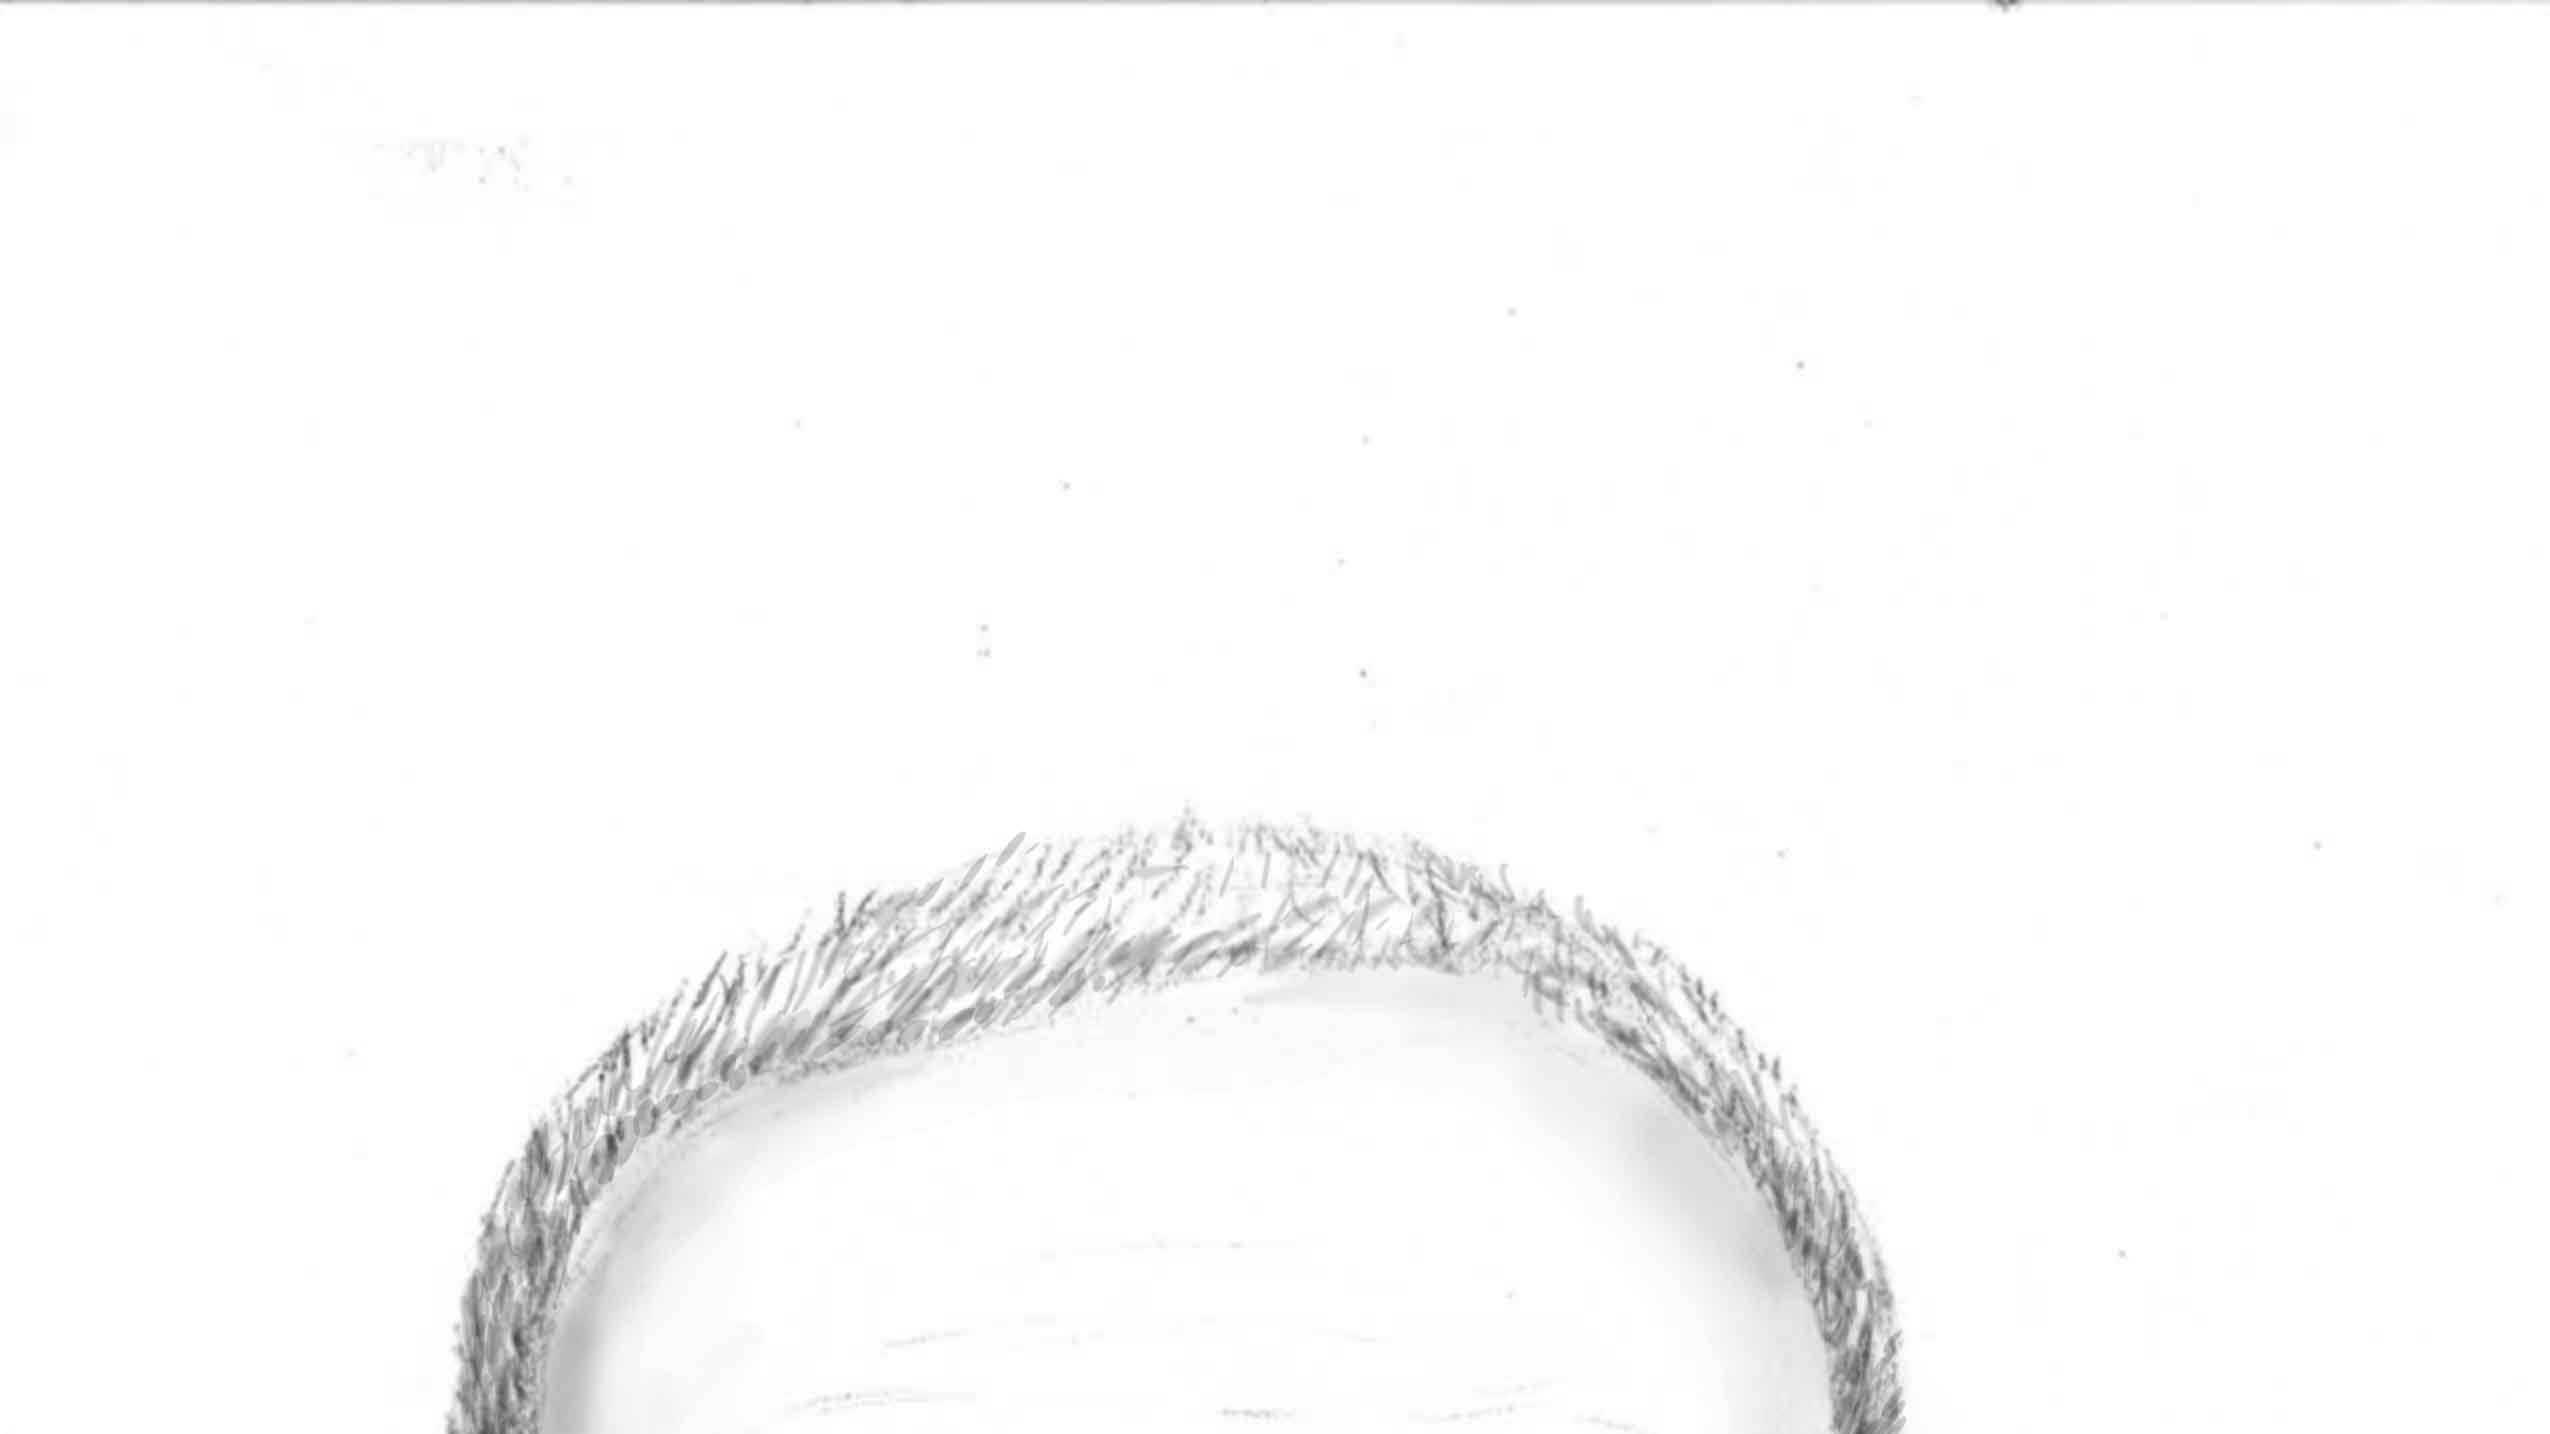 kissimmee suspicious incident sketch